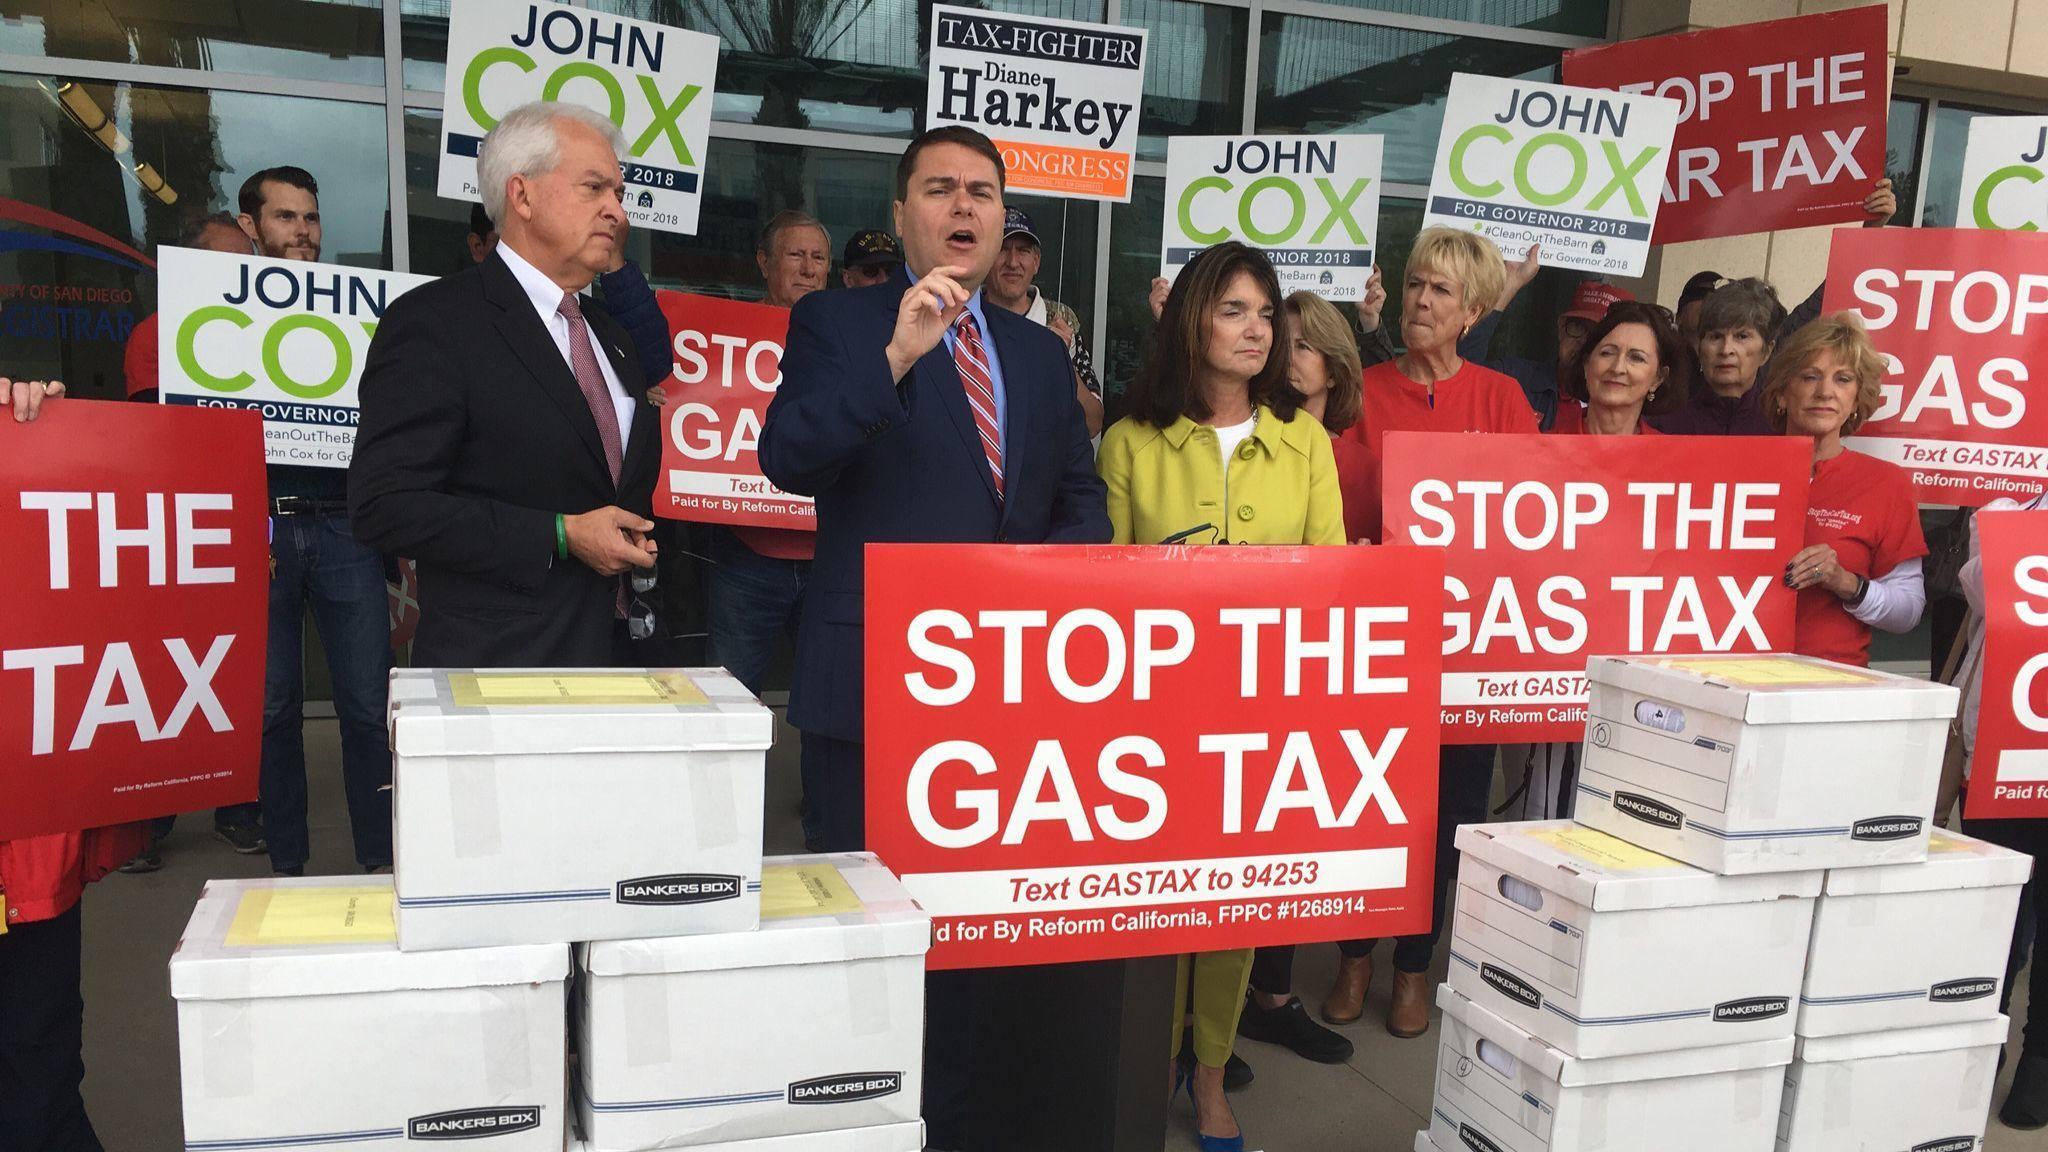 Republican gubernatorial candidate John Cox, left, and organizer Carl DeMaio, center, who led a peti